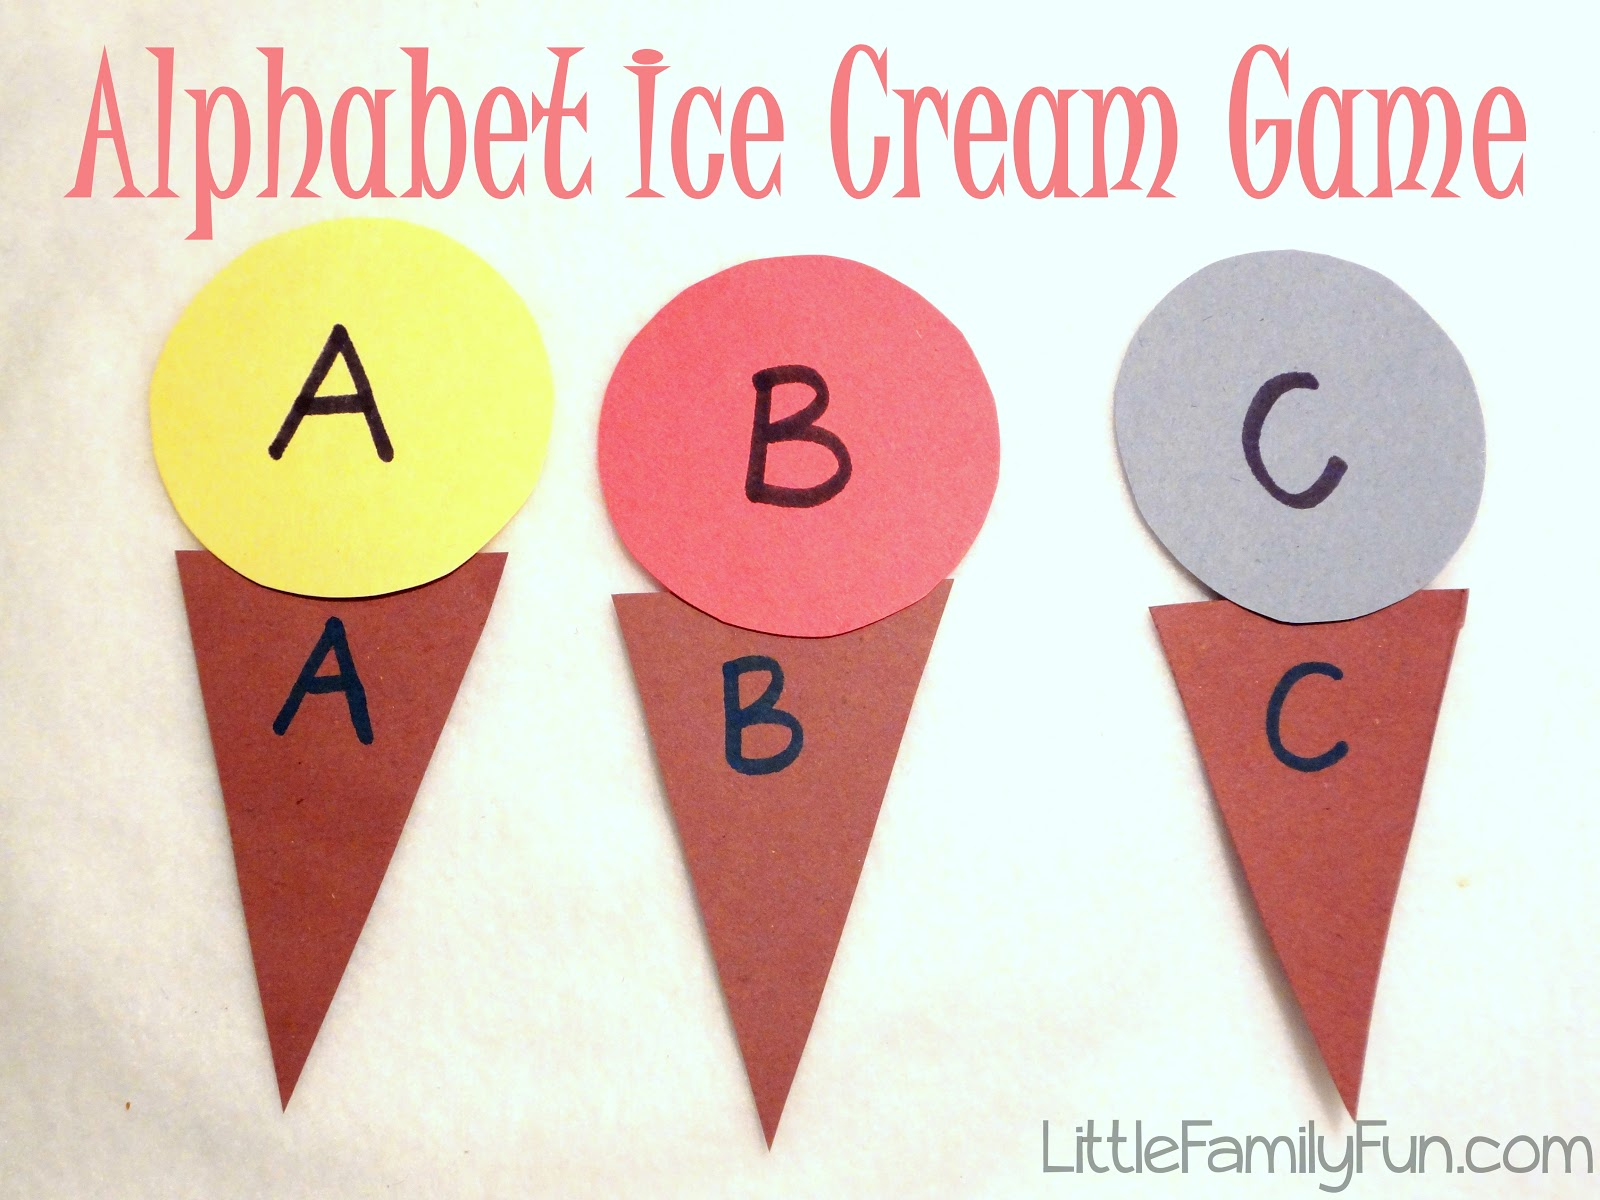 Little Family Fun Alphabet Ice Cream Game